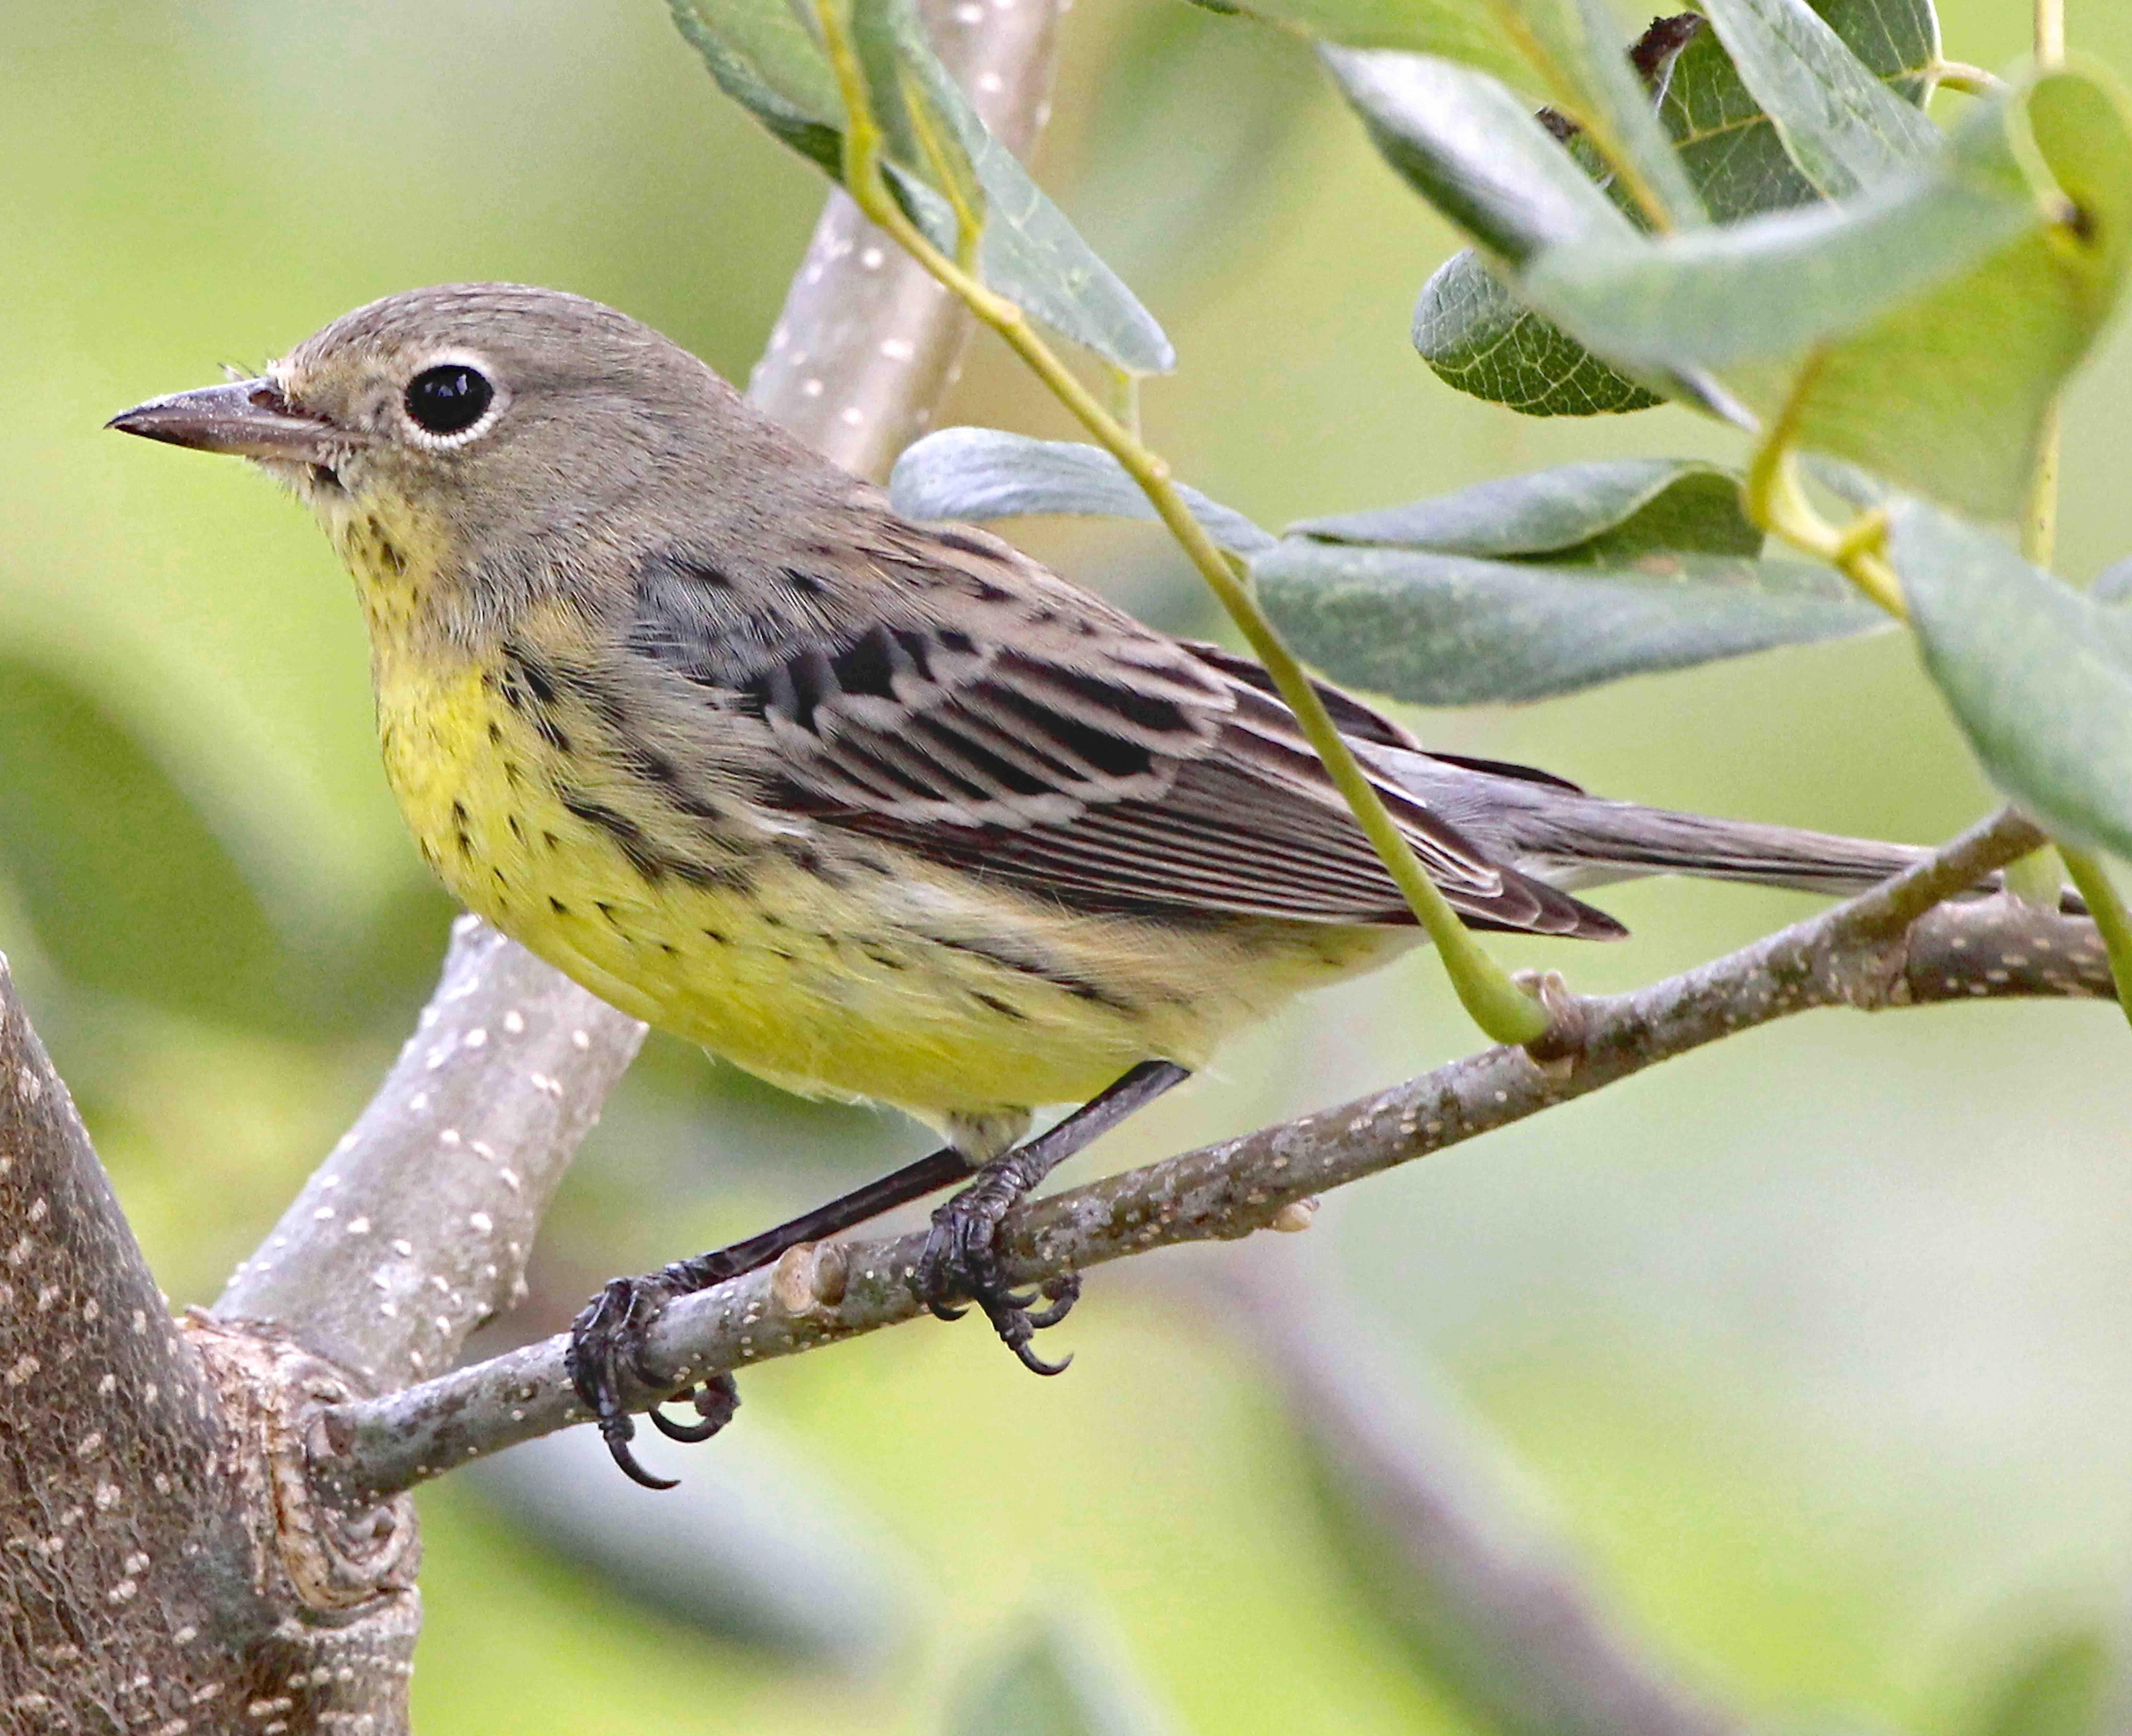 Kirtland's Warbler Abaco Bahamas (Bruce Hallett)